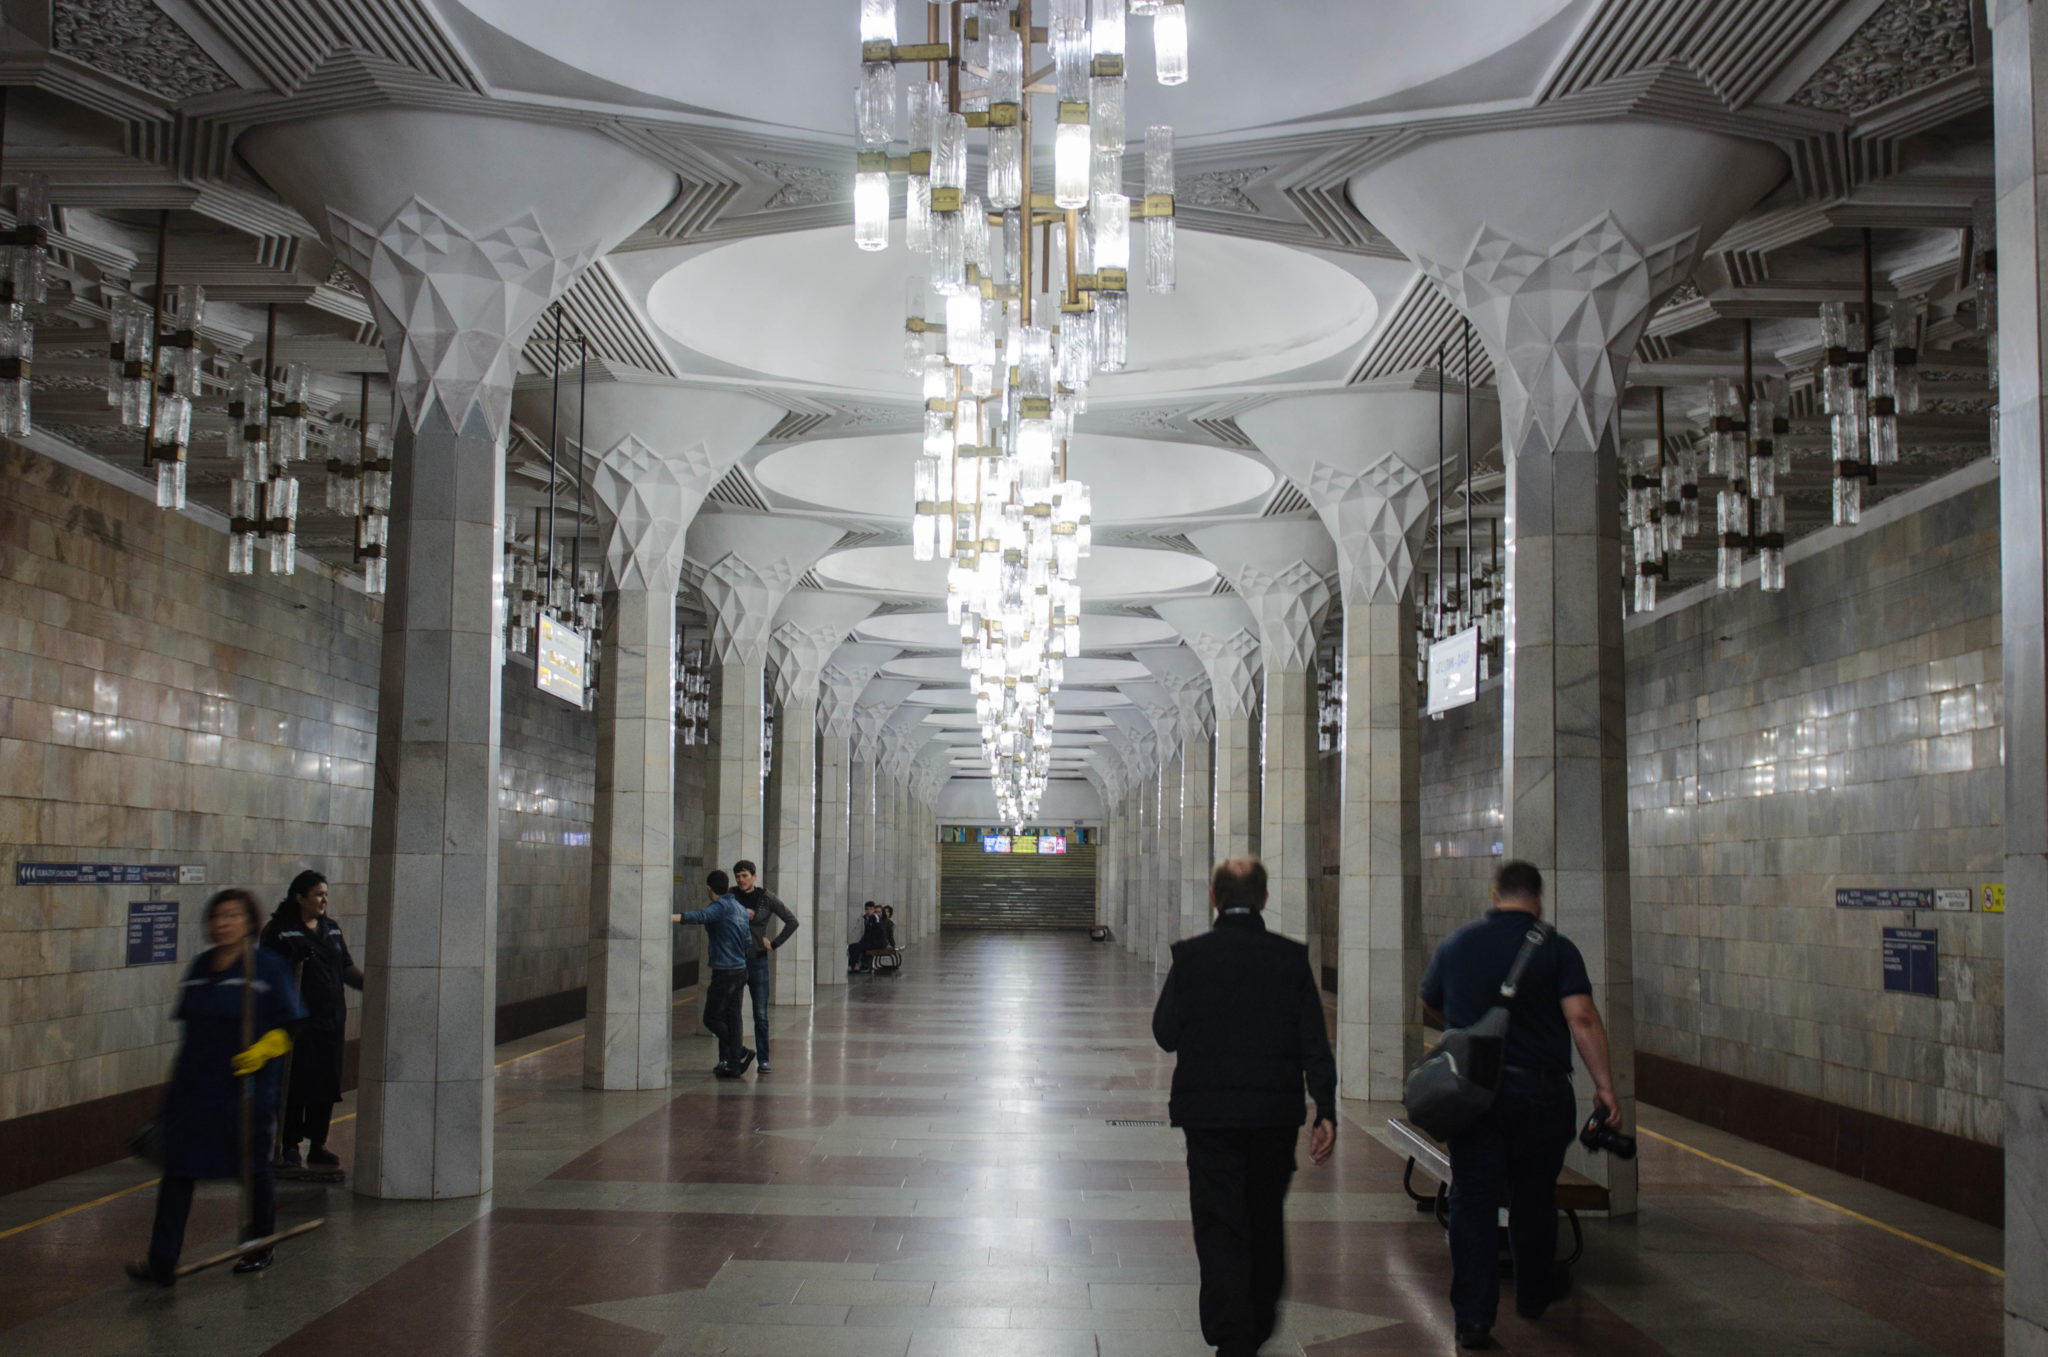 Taschkent Usbekistan Reisetipps